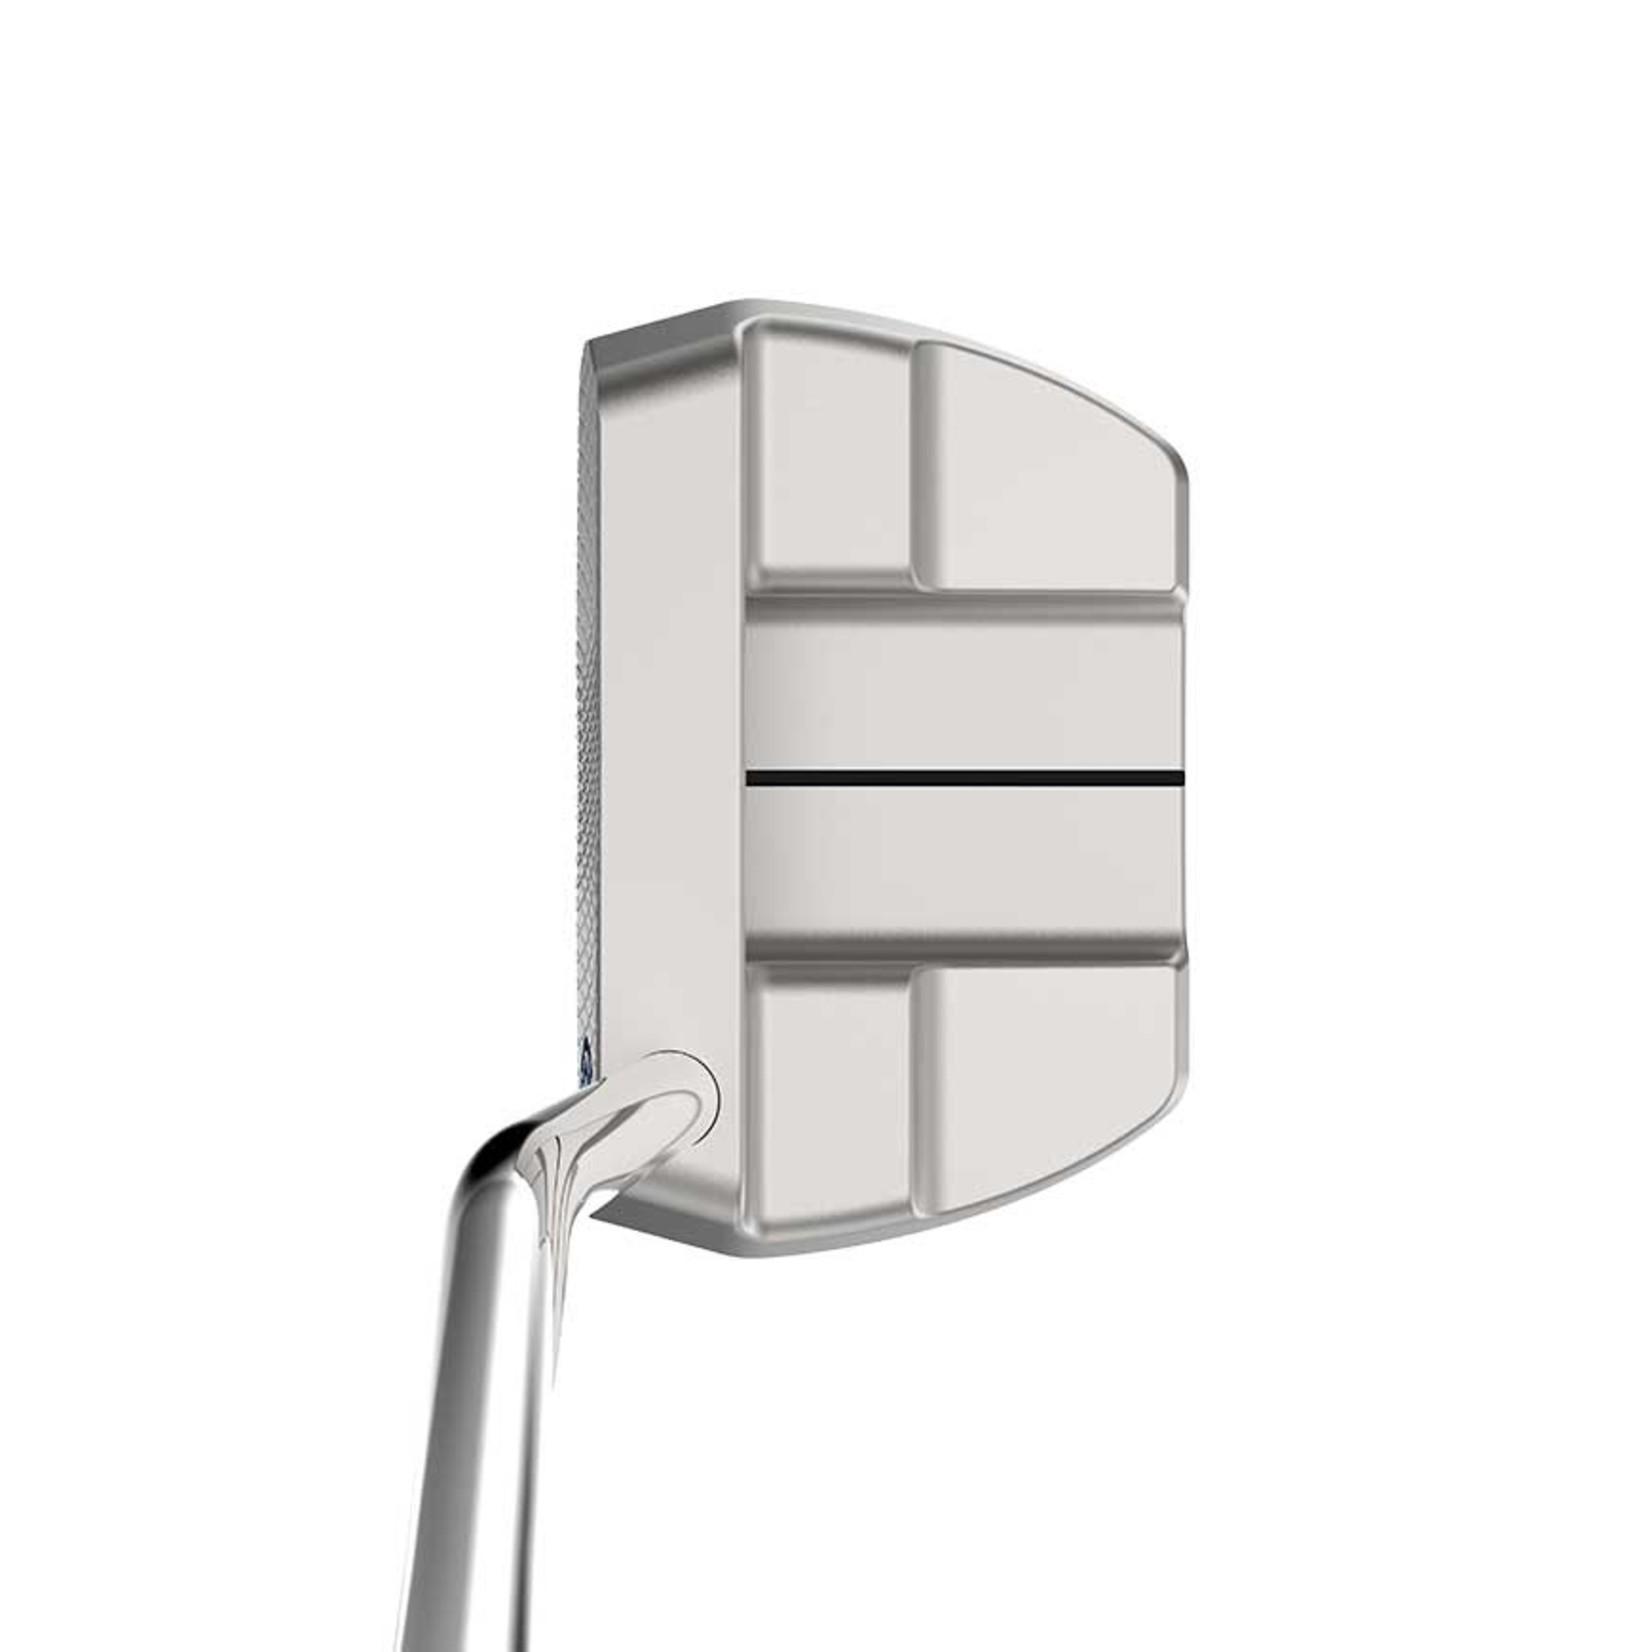 Cleveland Golf Cleveland HB Soft Putter